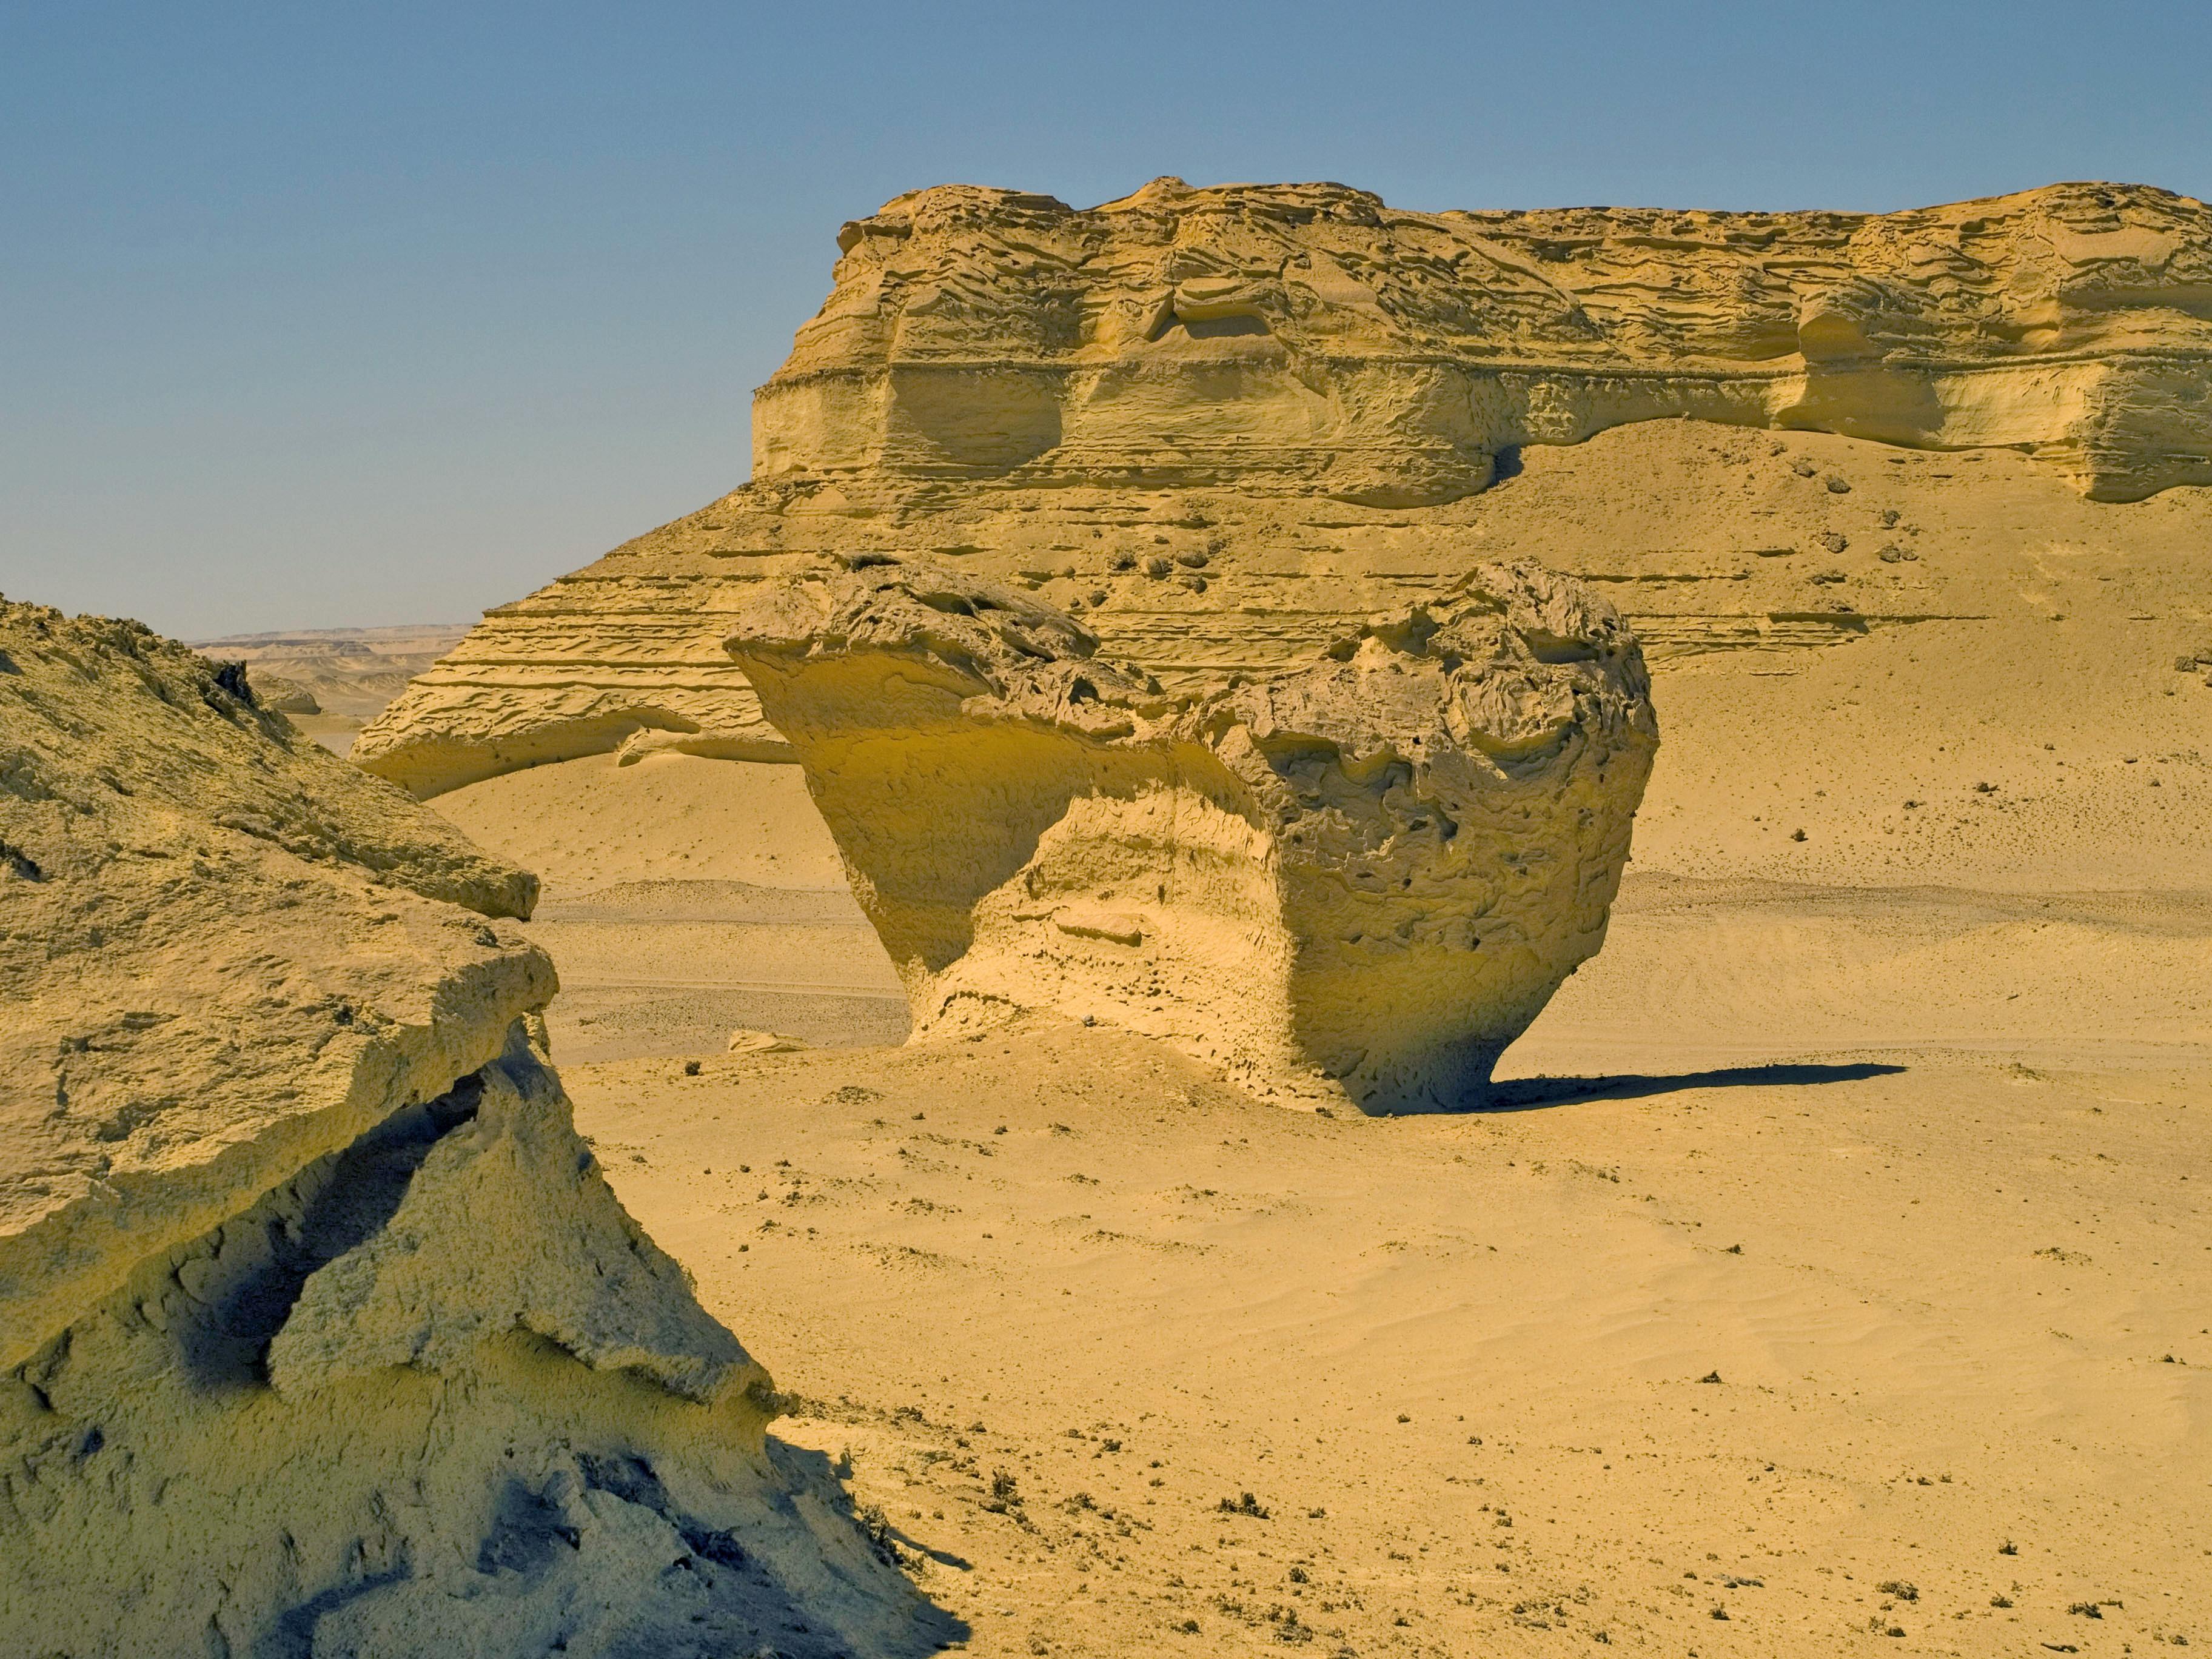 File:Wind erosion in Wadi Al-Hitan.jpg - Wikimedia Commons